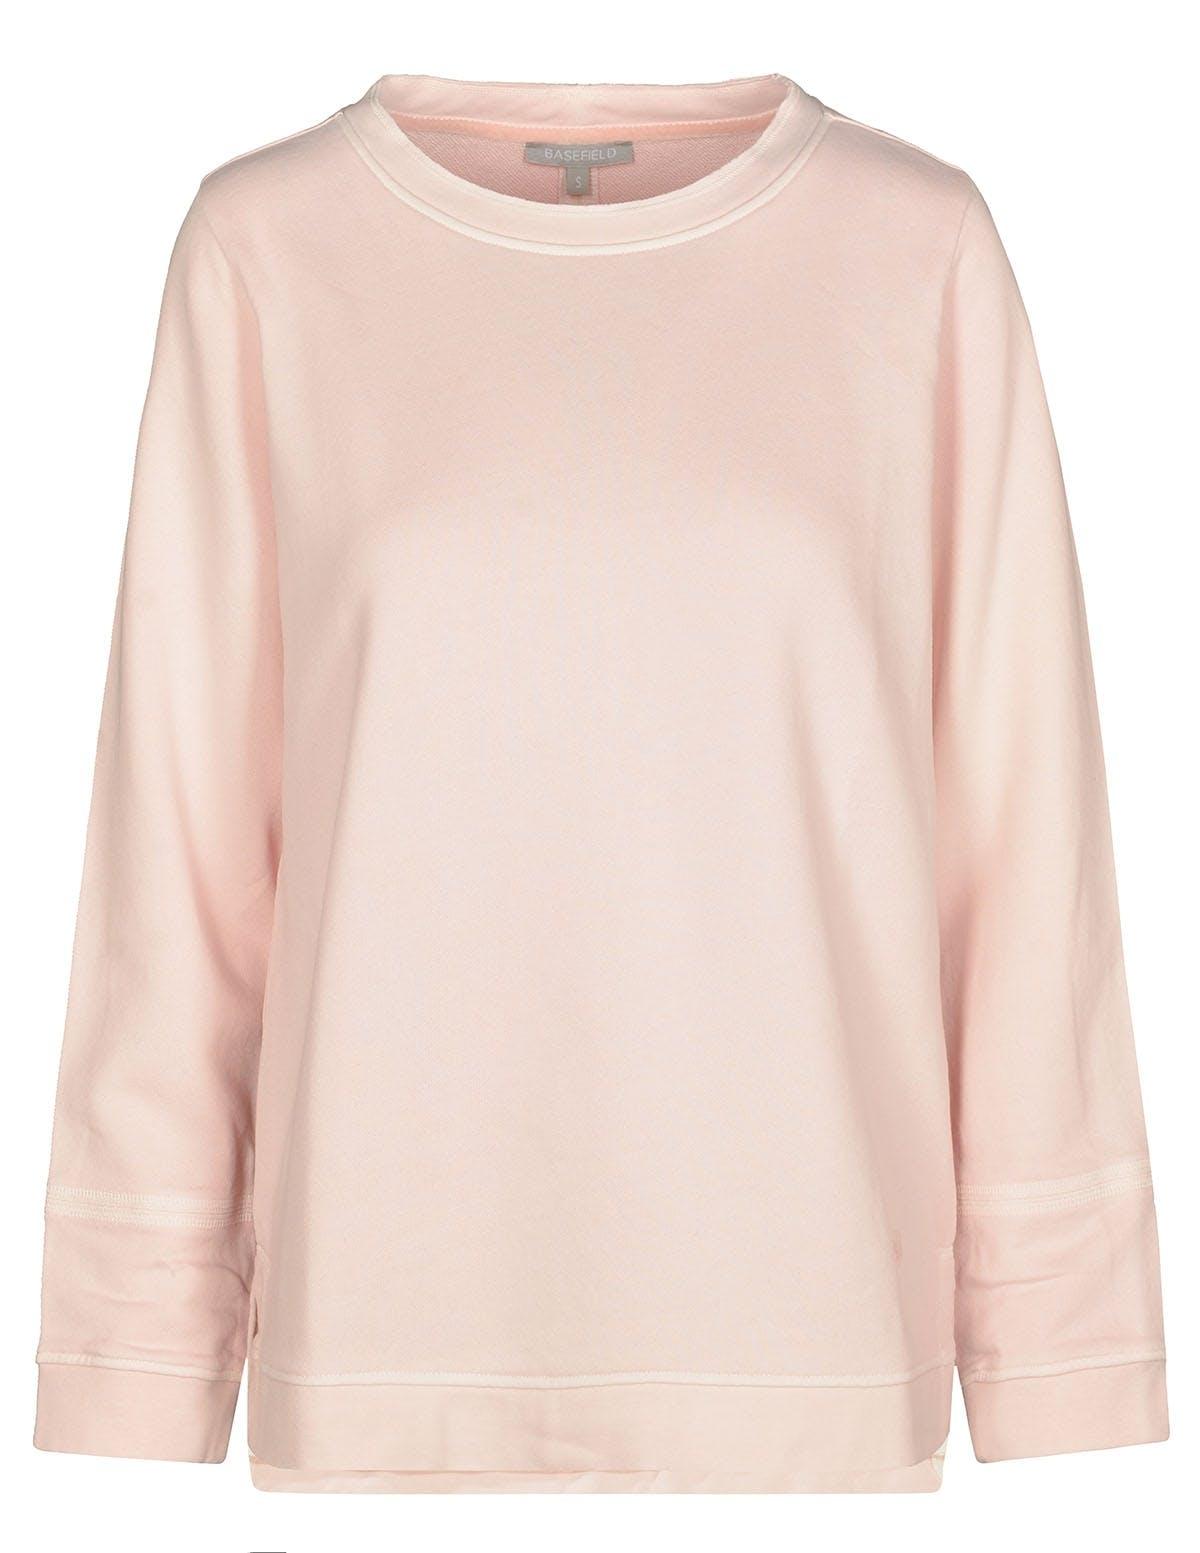 ORGANIC COTTON Sweatshirt washed - Orchid Pink